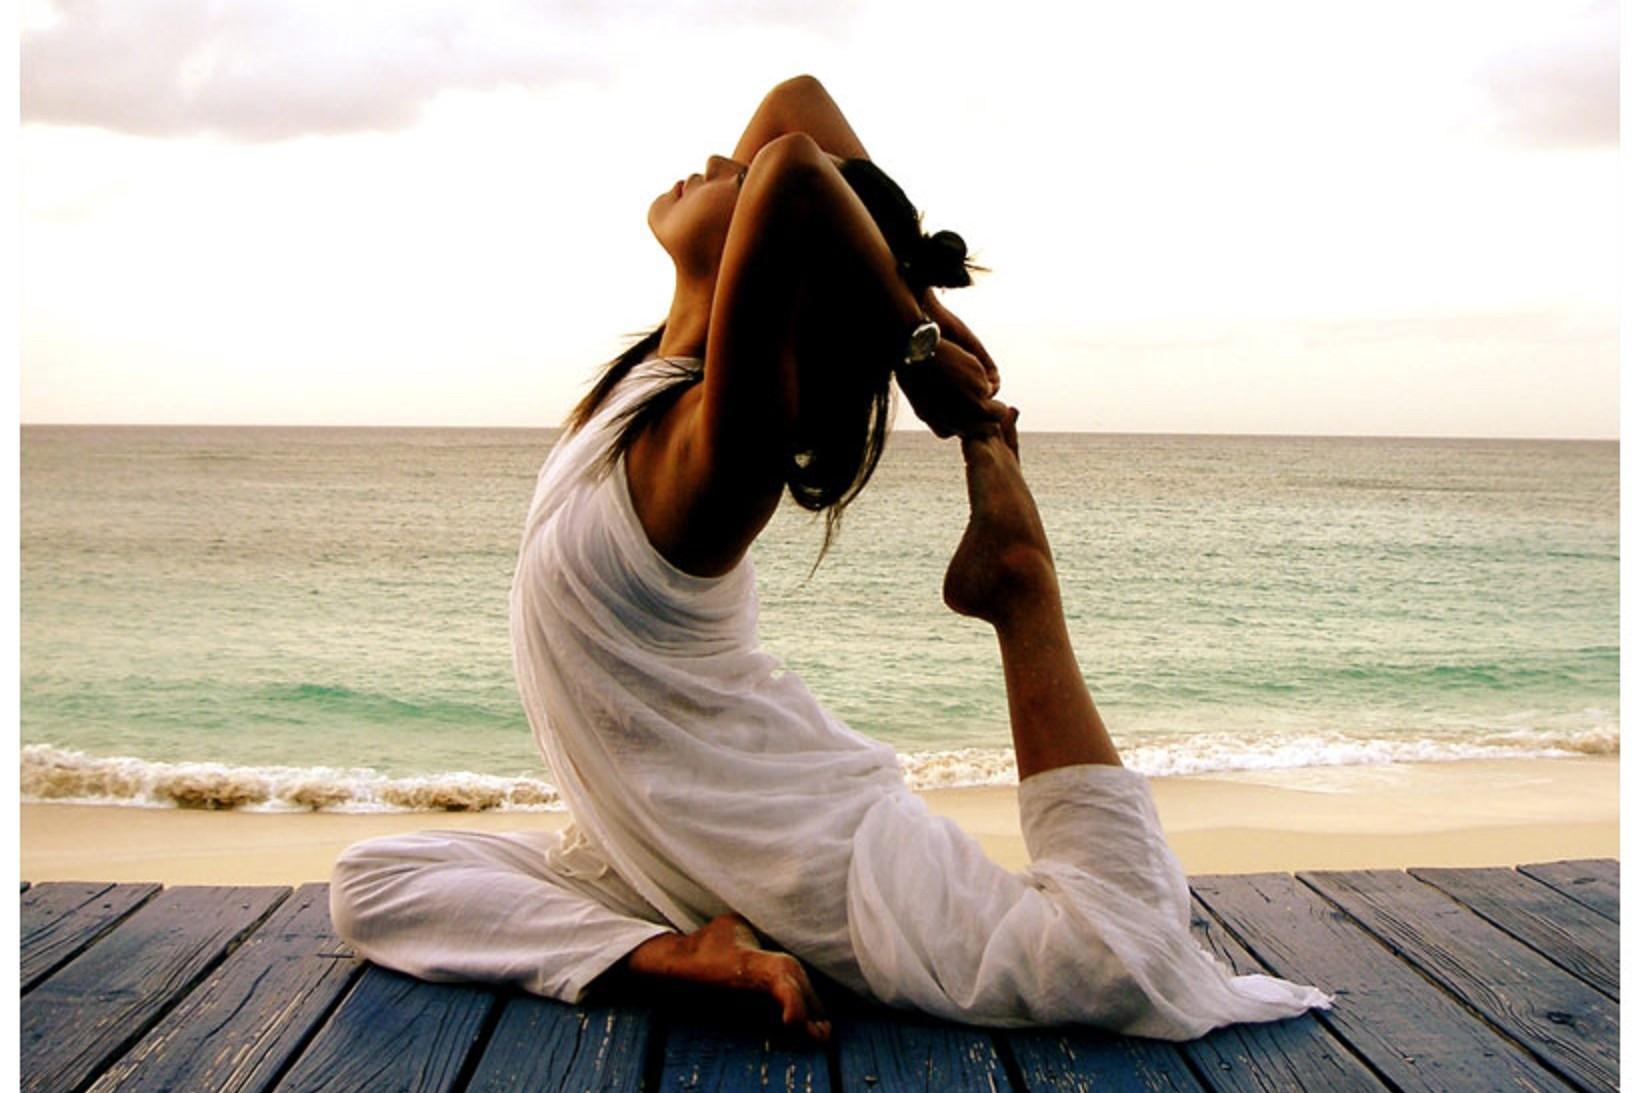 giam tac dung phu khi hoa tri voi yoga